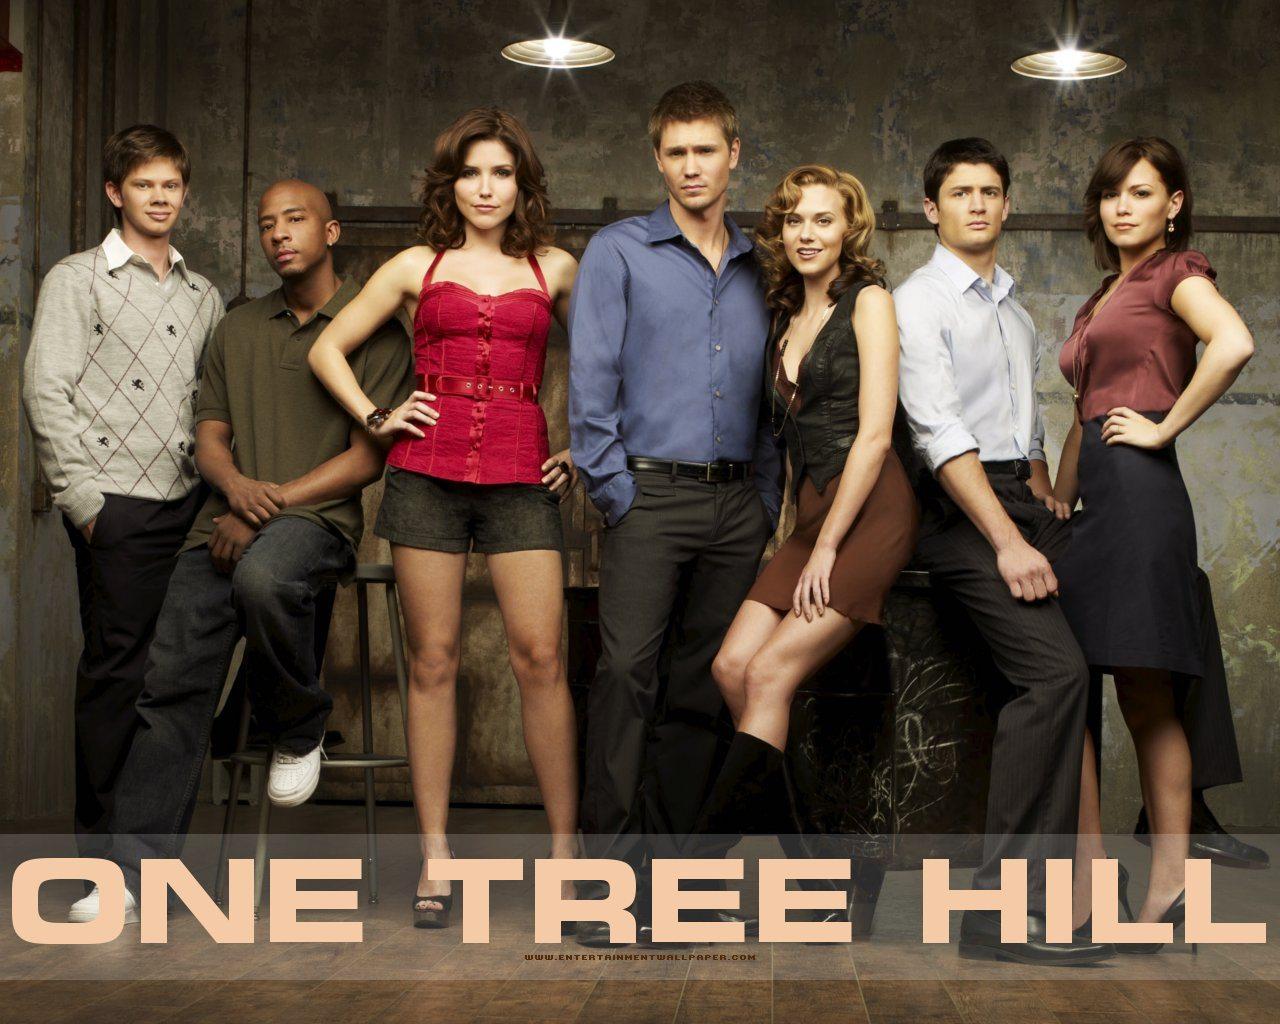 one tree hill season 6 episode 17 summary